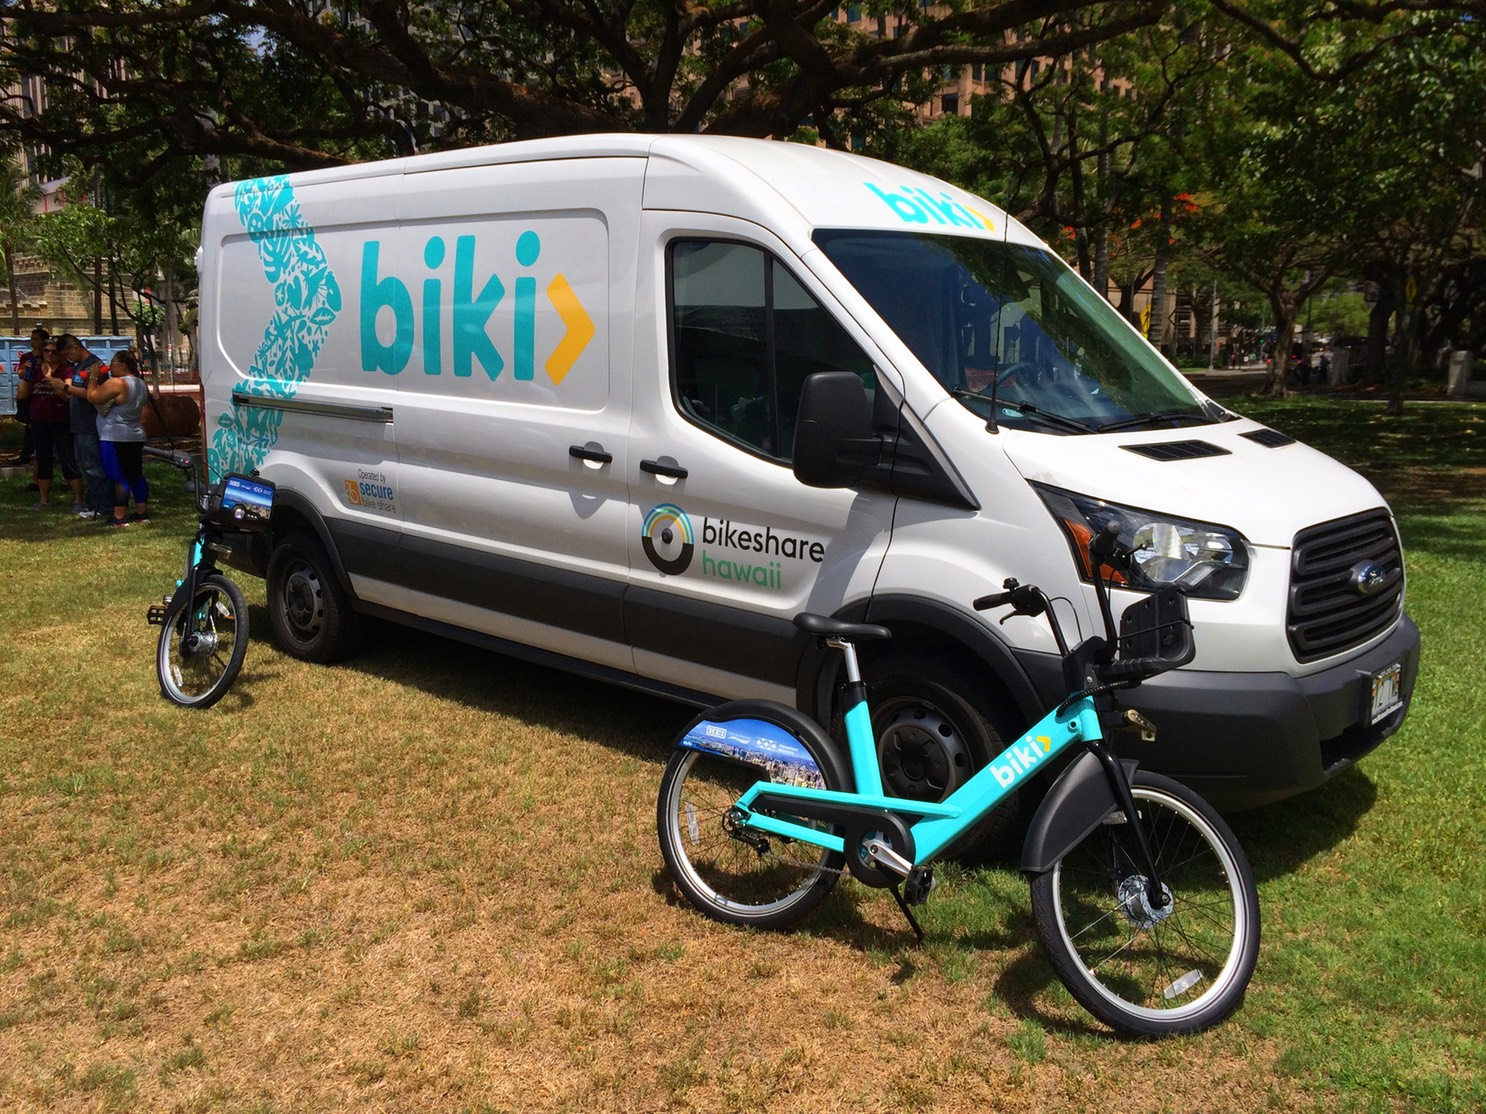 ae08d0847e Biki - Bike Share Honolulu Service Vehicle Graphics